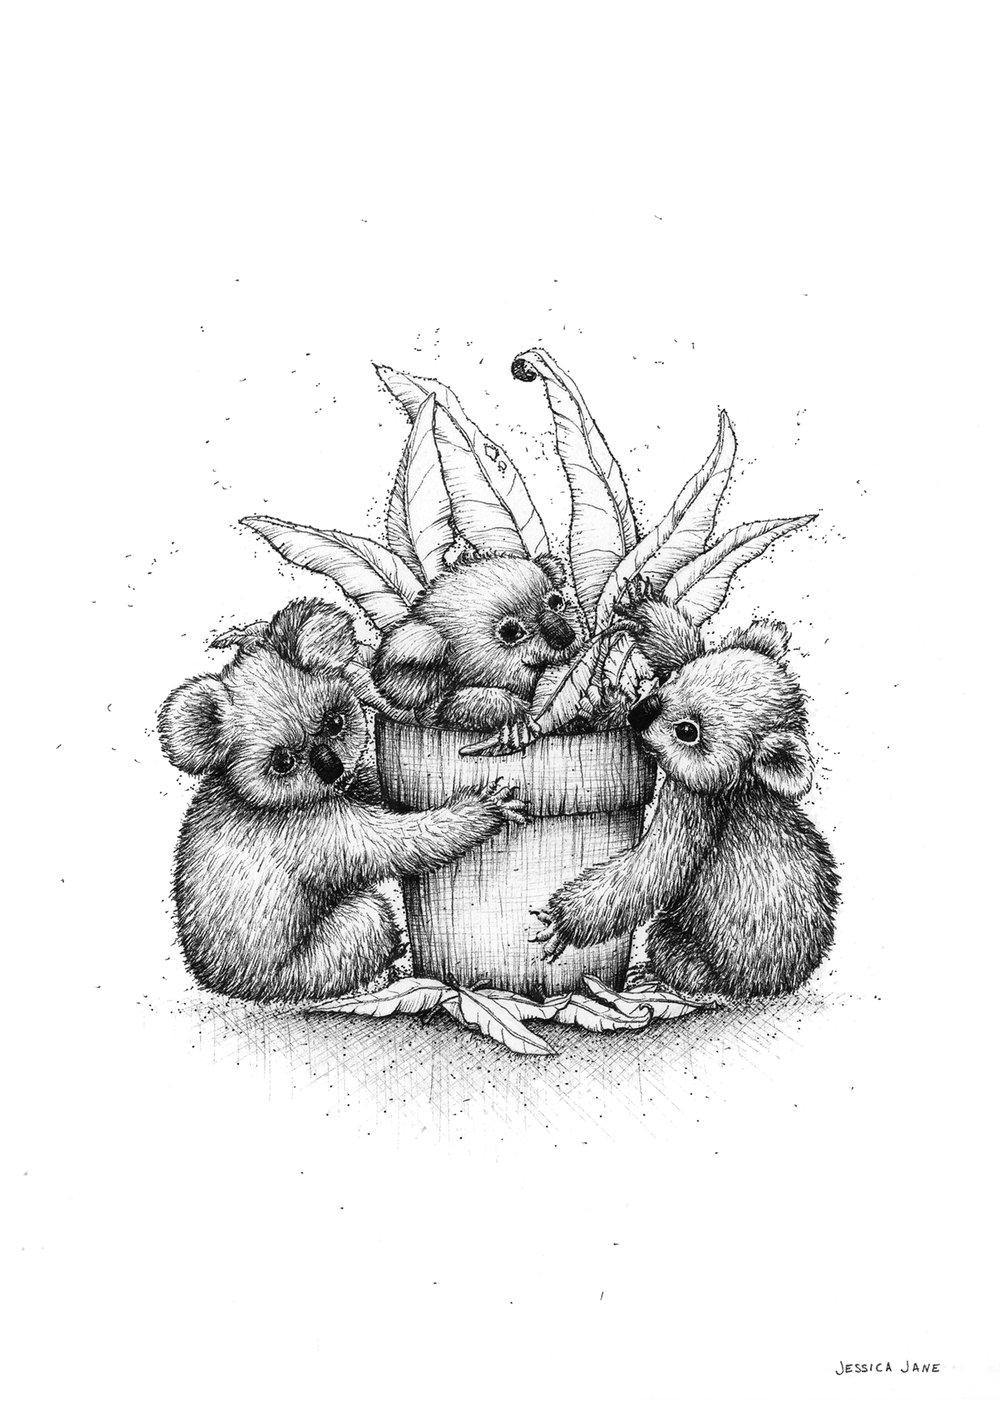 HUNGRY KOALAS